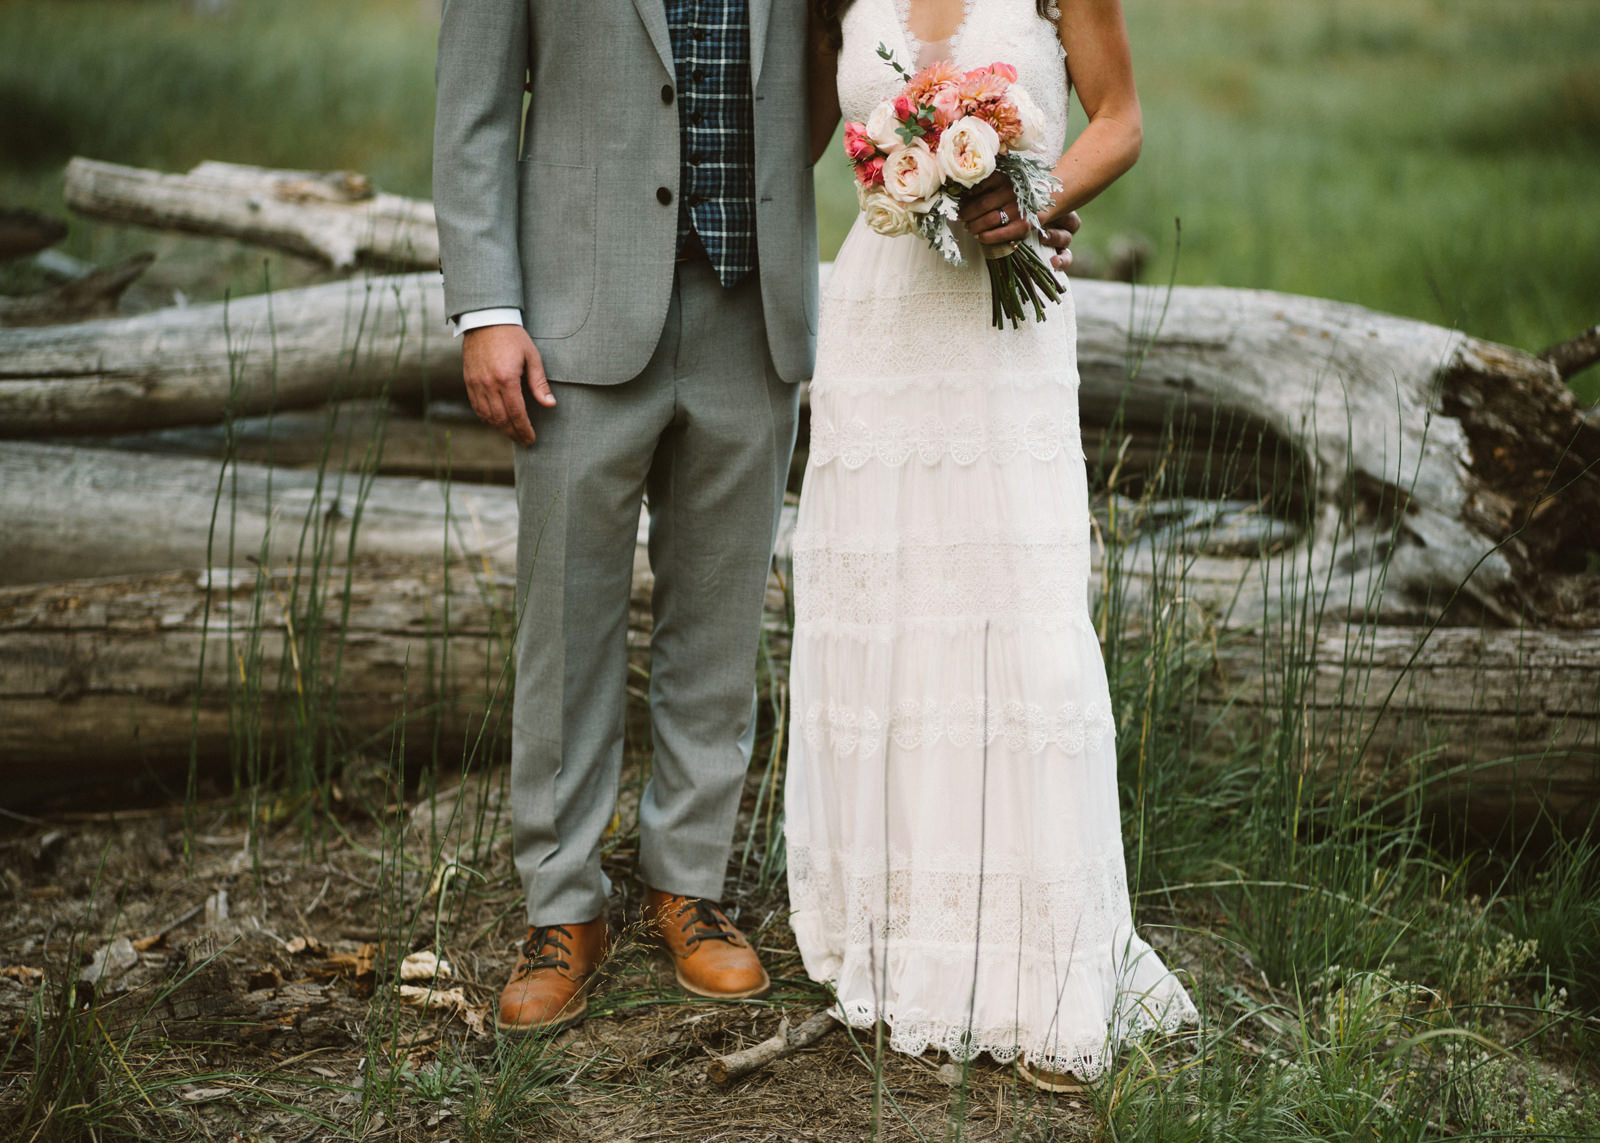 yosemite-intimate-wedding-082 YOSEMITE INTIMATE WEDDING